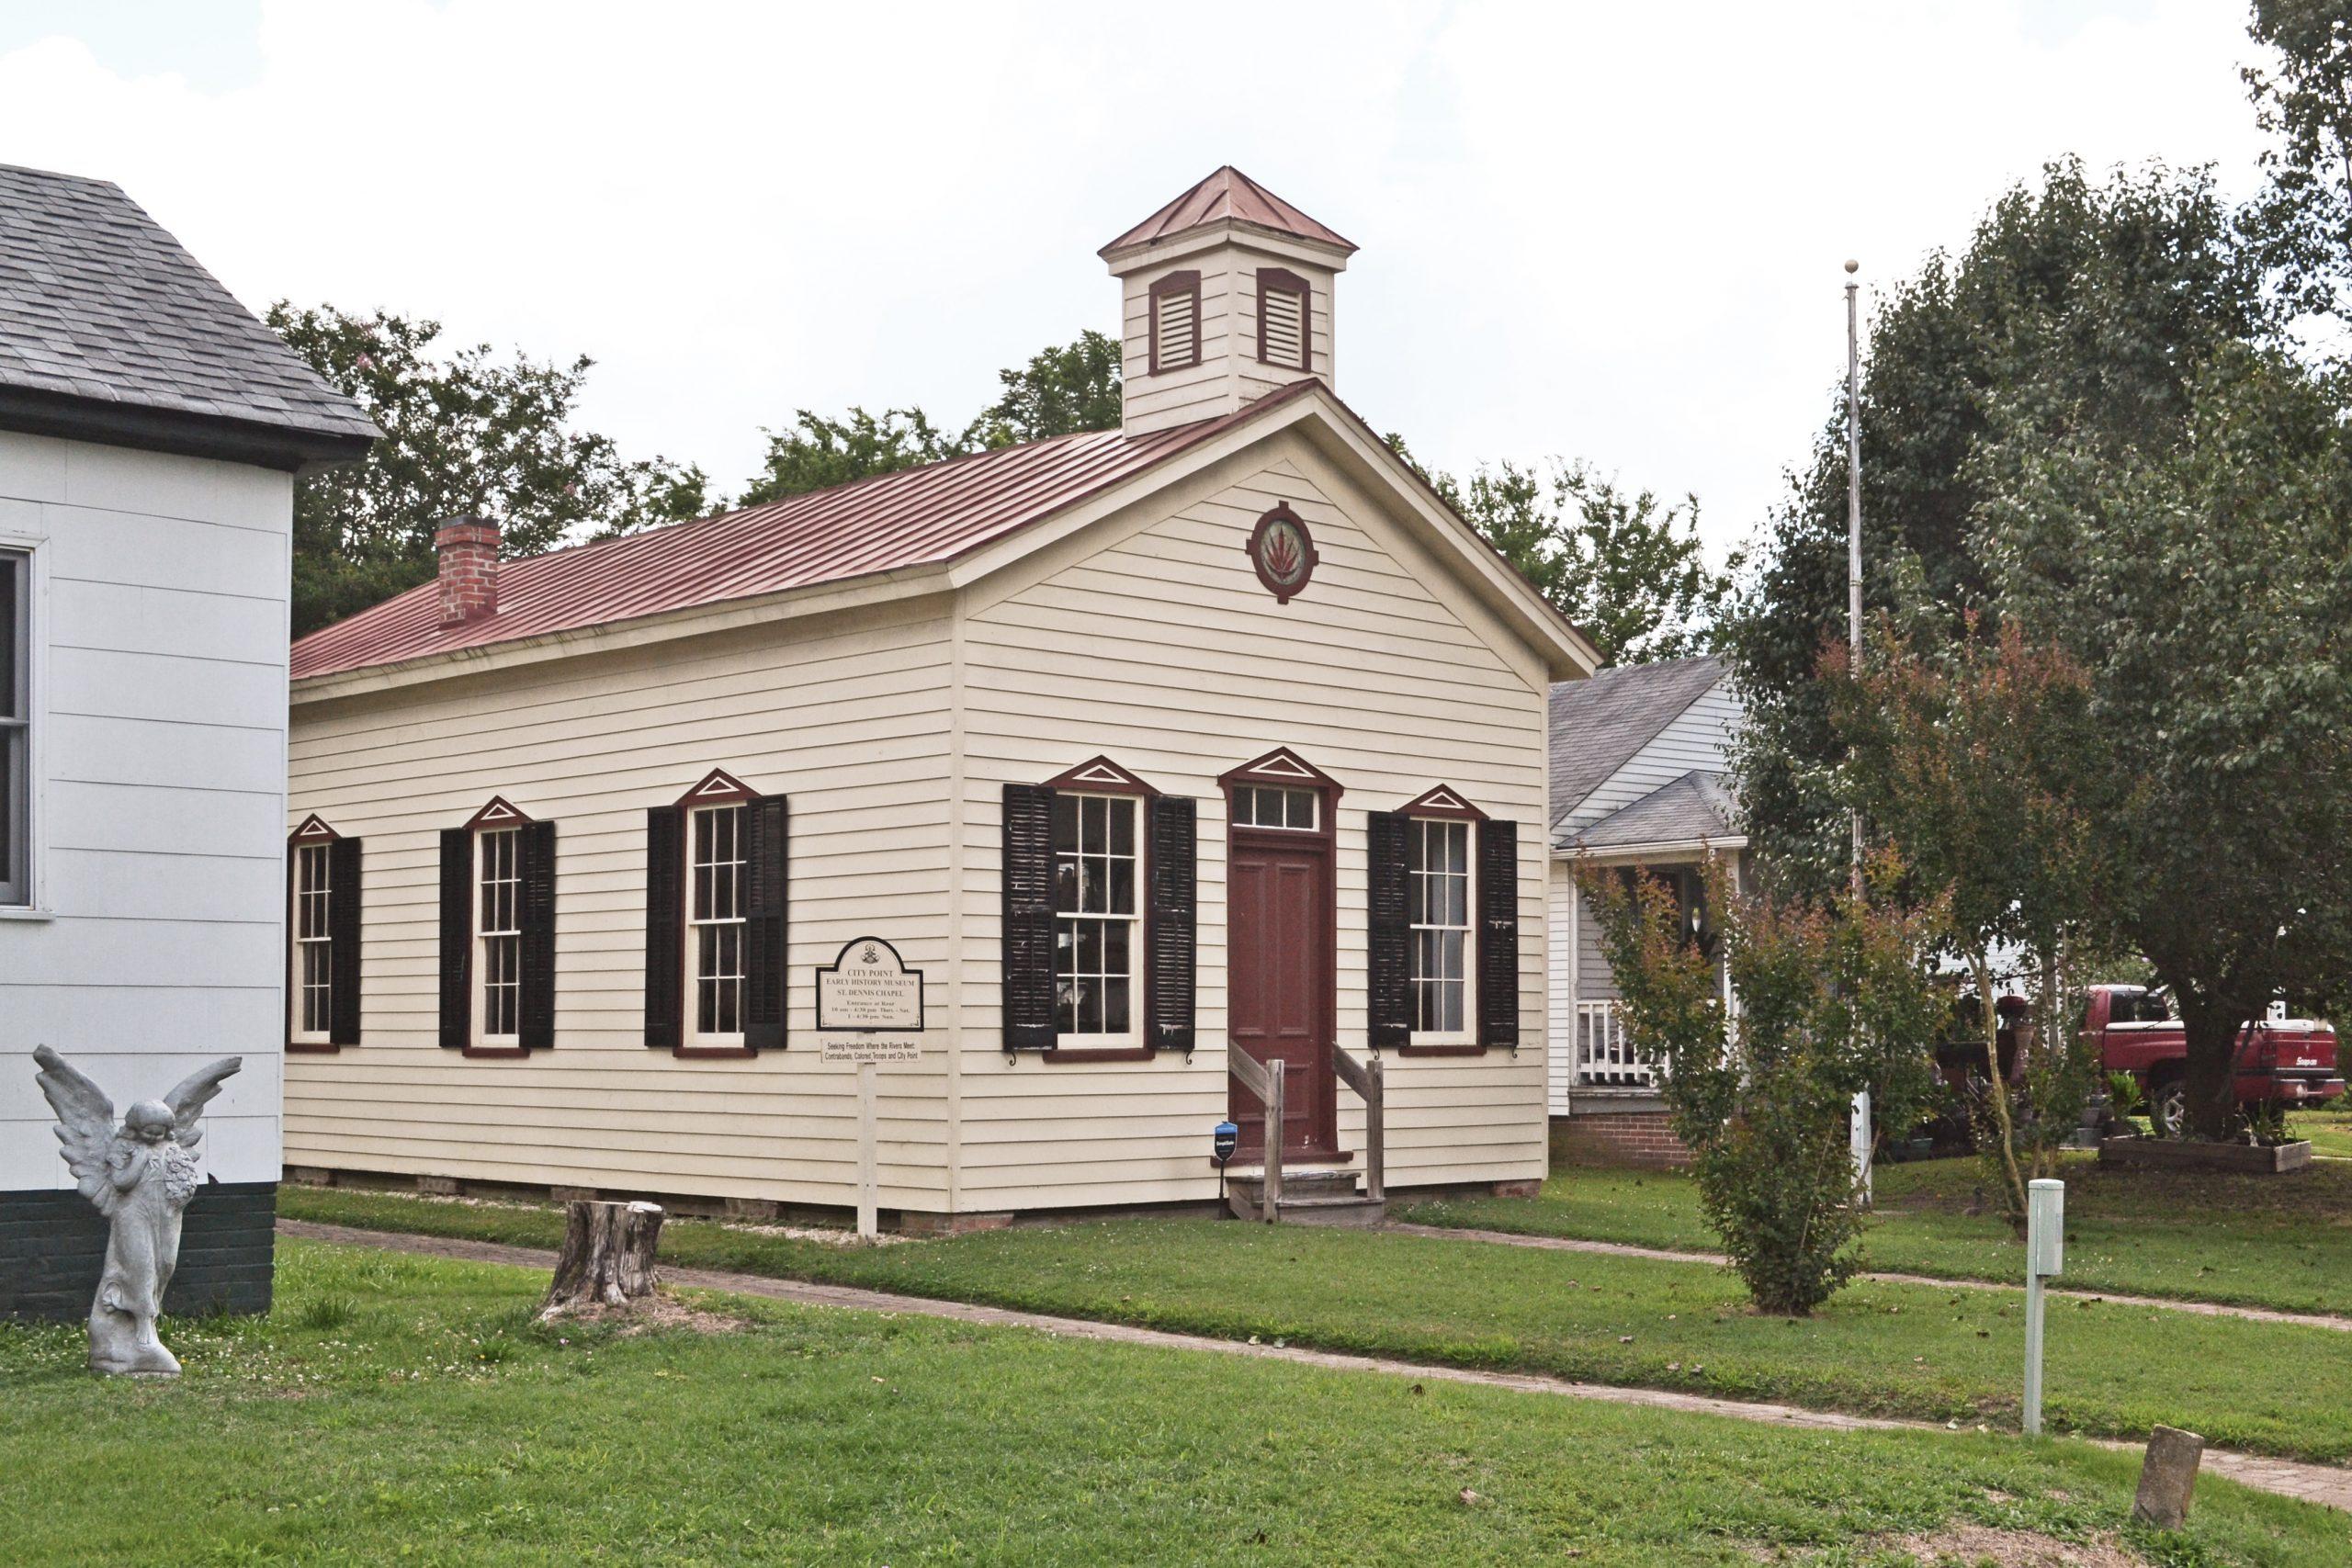 City Point Historic District